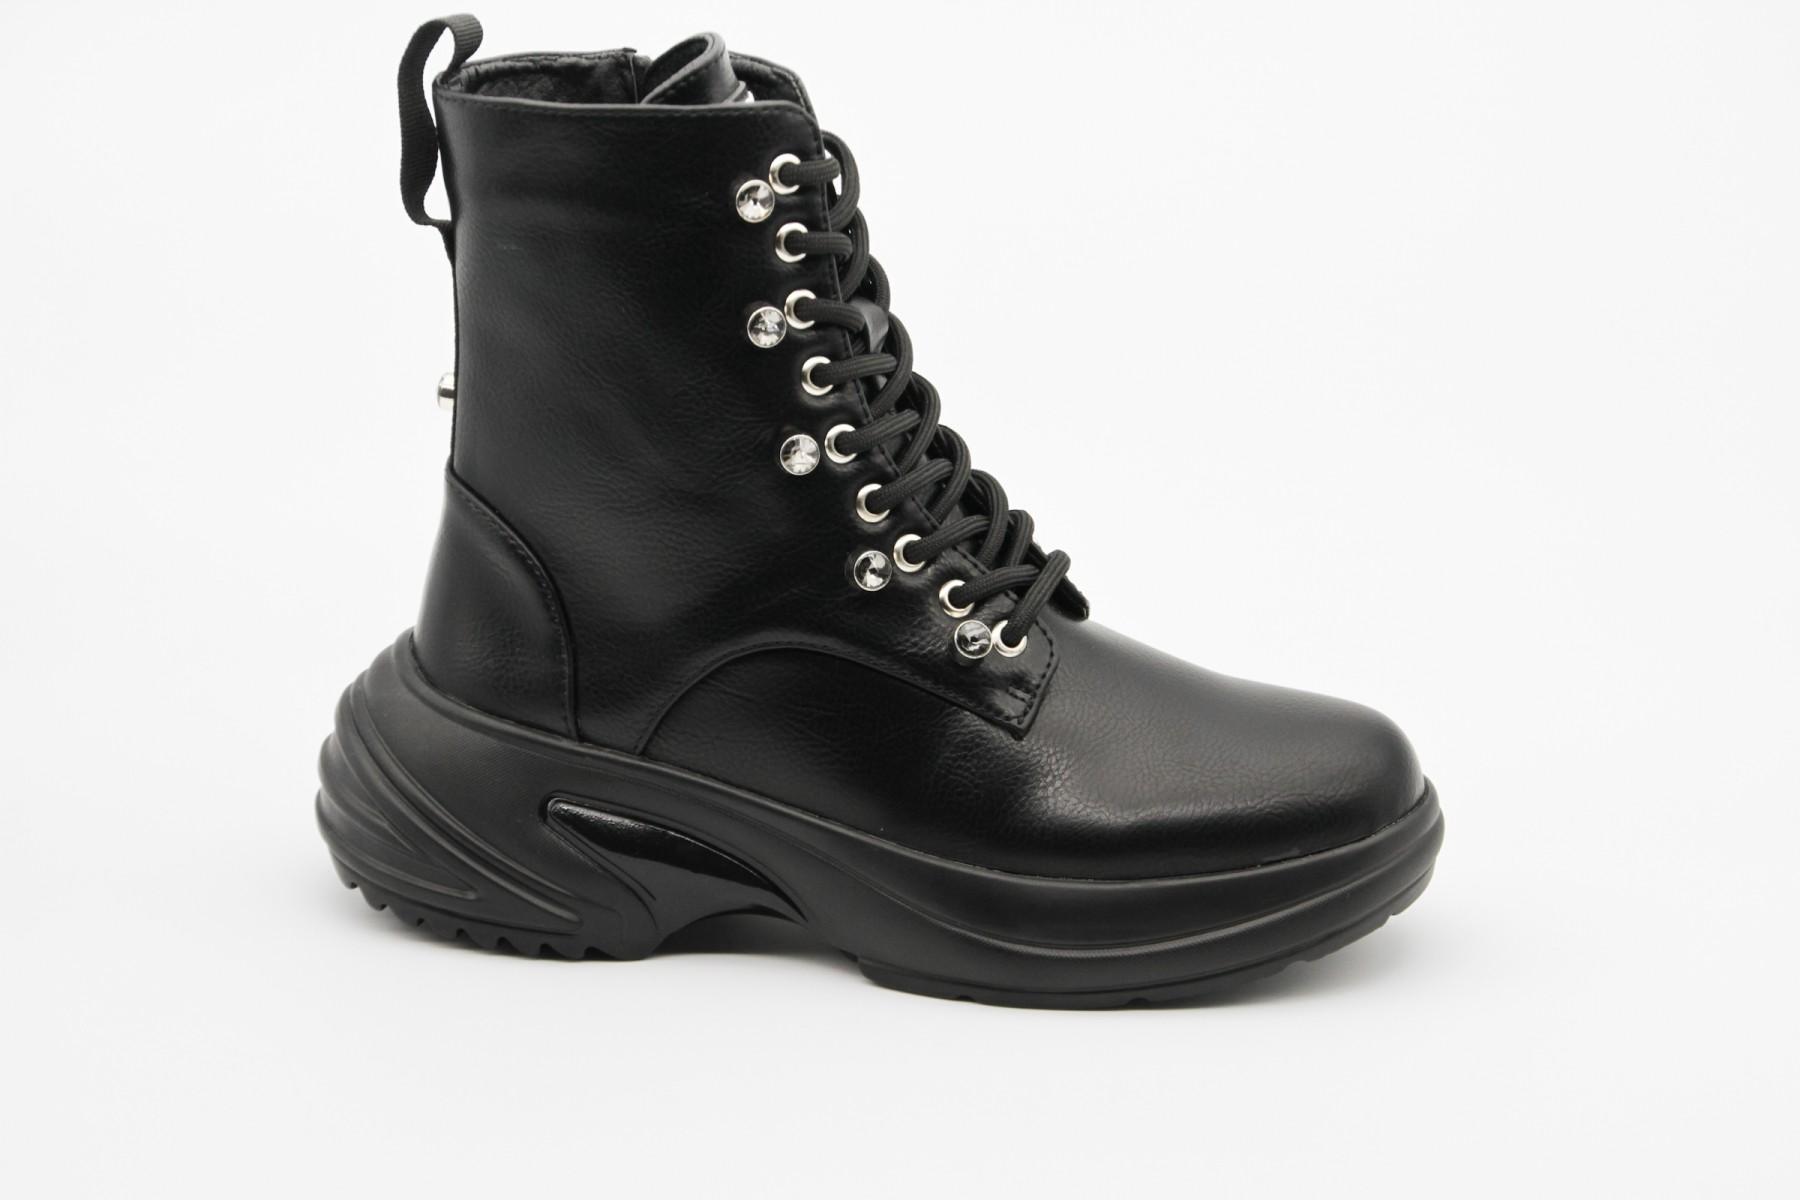 Демисезонные ботинки BSK21-42/04 850грн фото